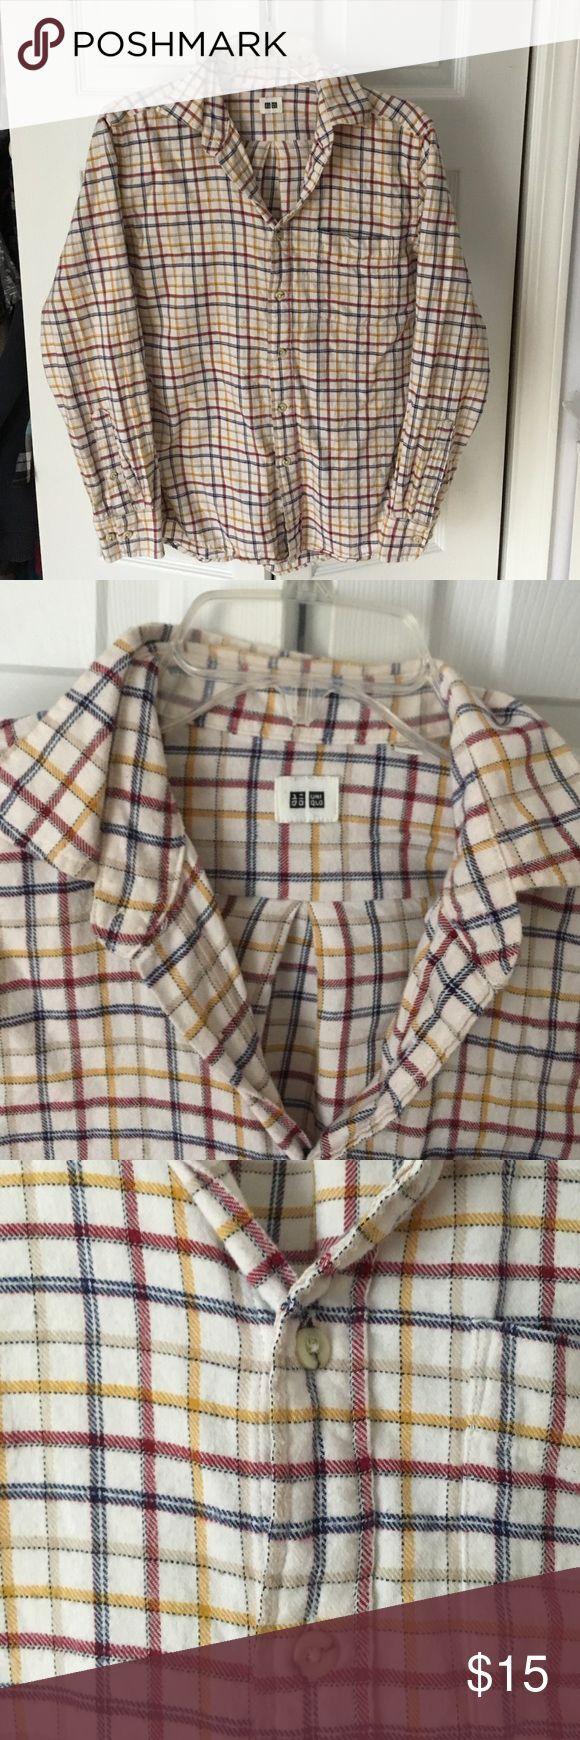 Button down flannel from Uniqlo Striped beige, red, and blue button down flannel from Uniqlo. Has front pocket. Uniqlo Shirts Casual Button Down Shirts